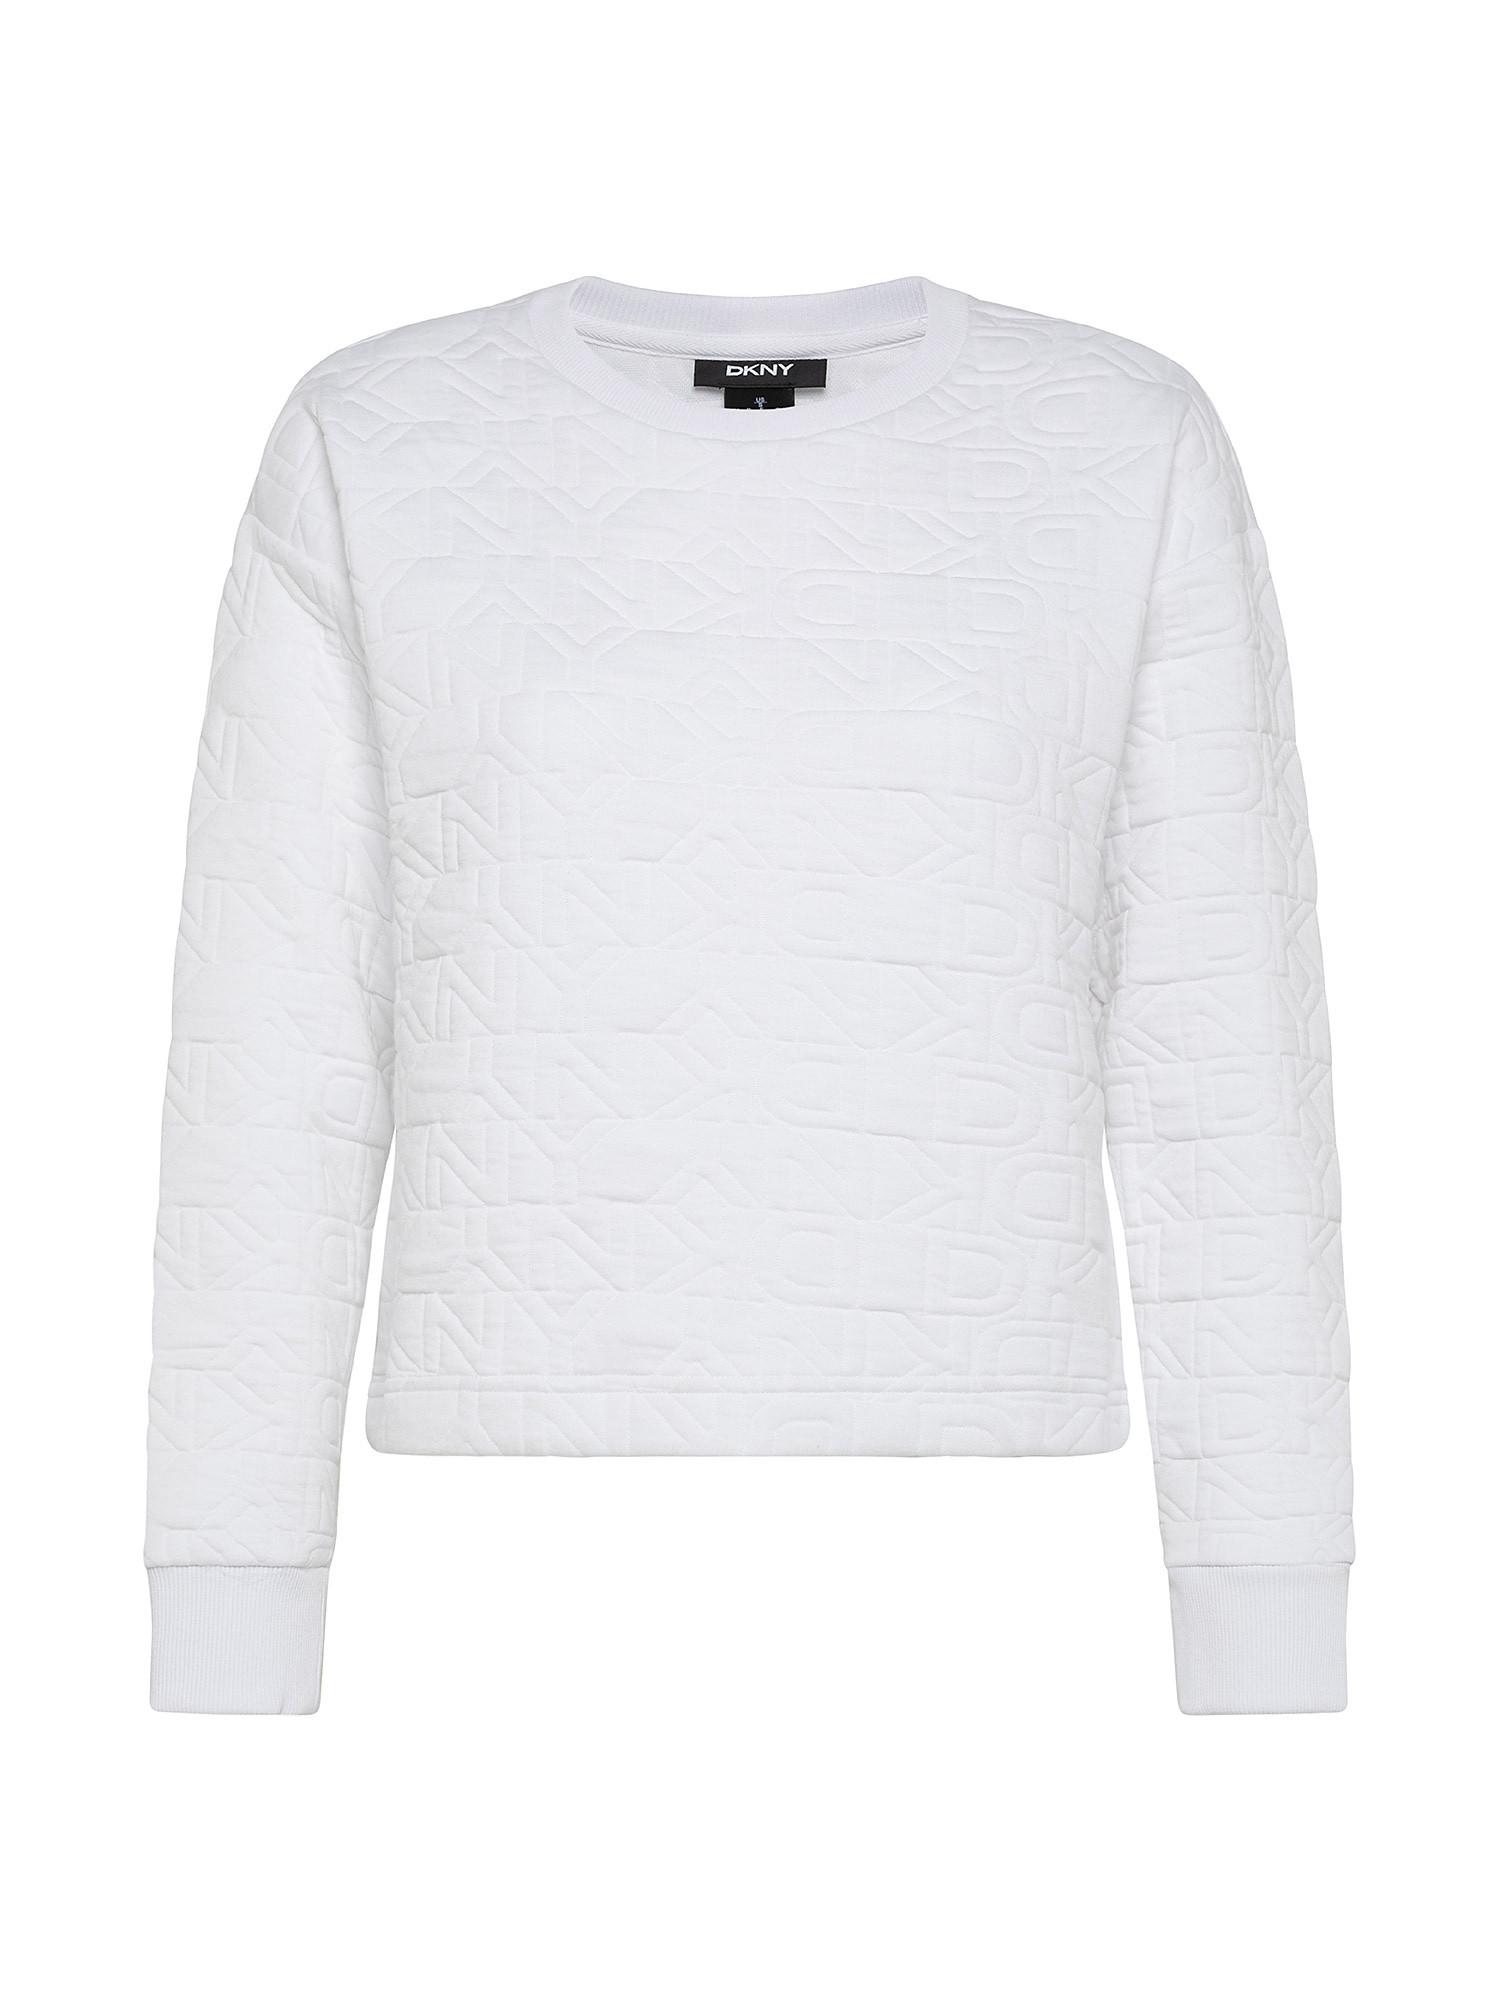 Felpa girocollo con logo ricamato, Bianco, large image number 0